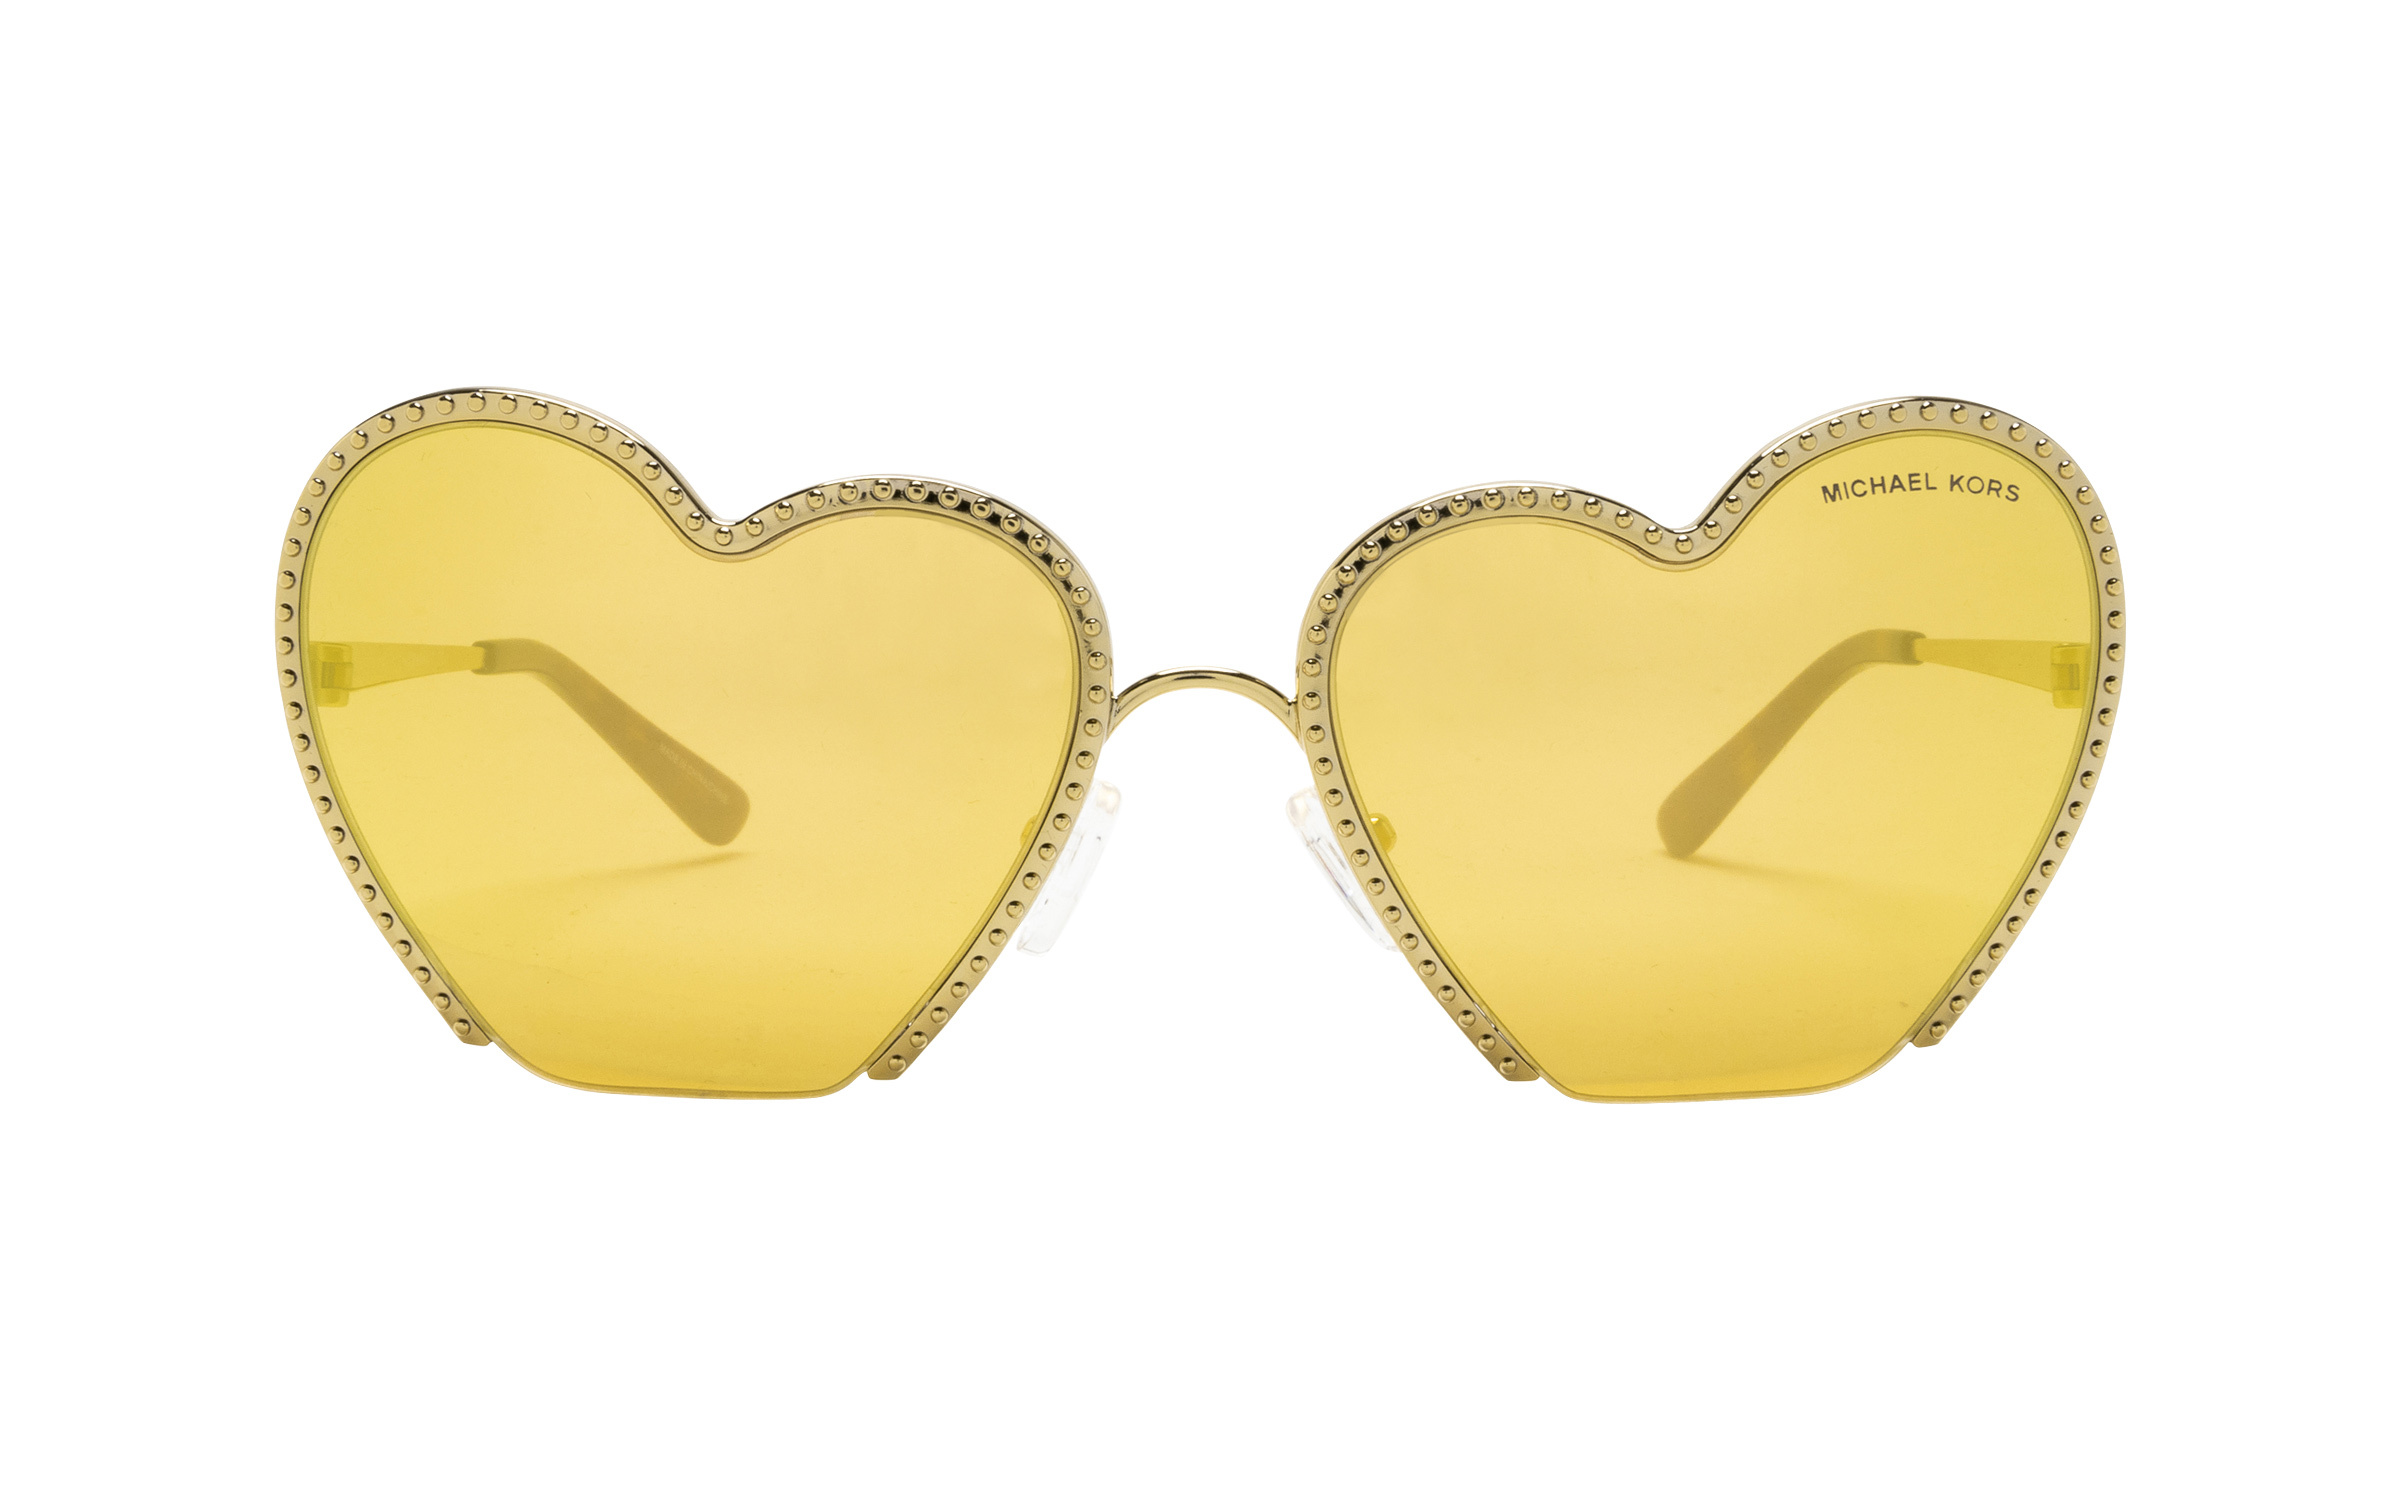 coastal.com - MichaelKors Michael Kors MK1068 Heart Breaker 10147J 60 Sunglasses in Light Gold | Metal – Online Coastal 178.00 USD